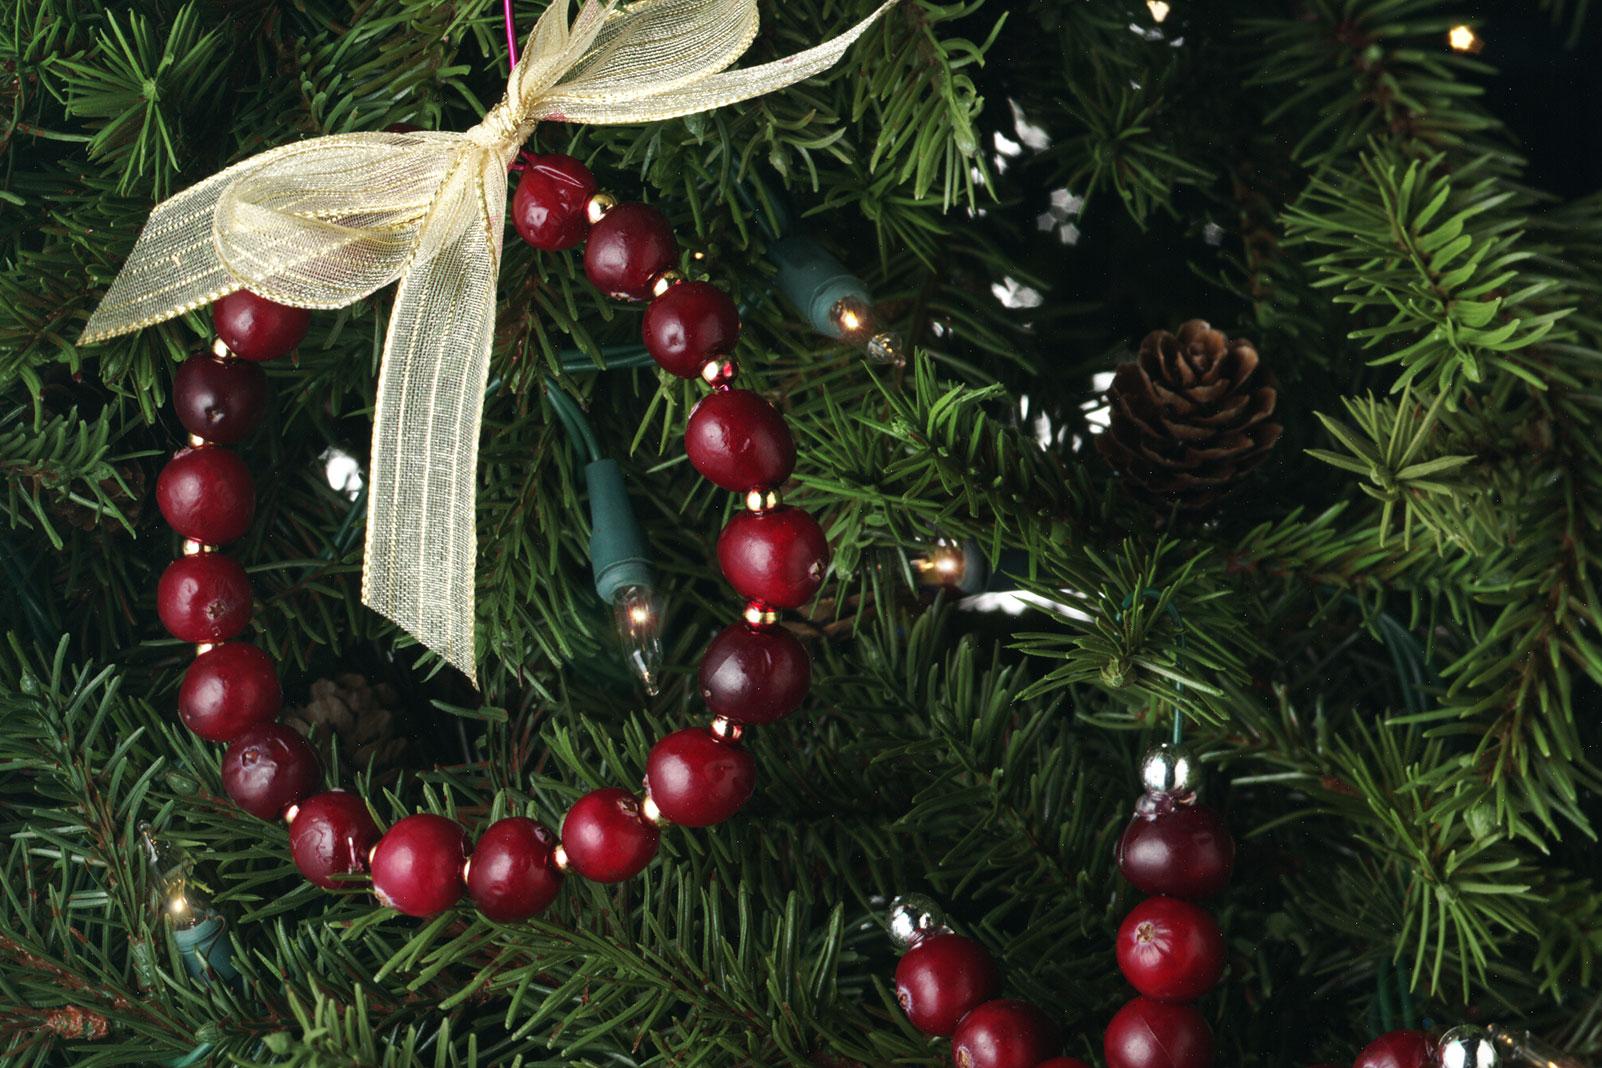 Cranberry Wreath Ornament